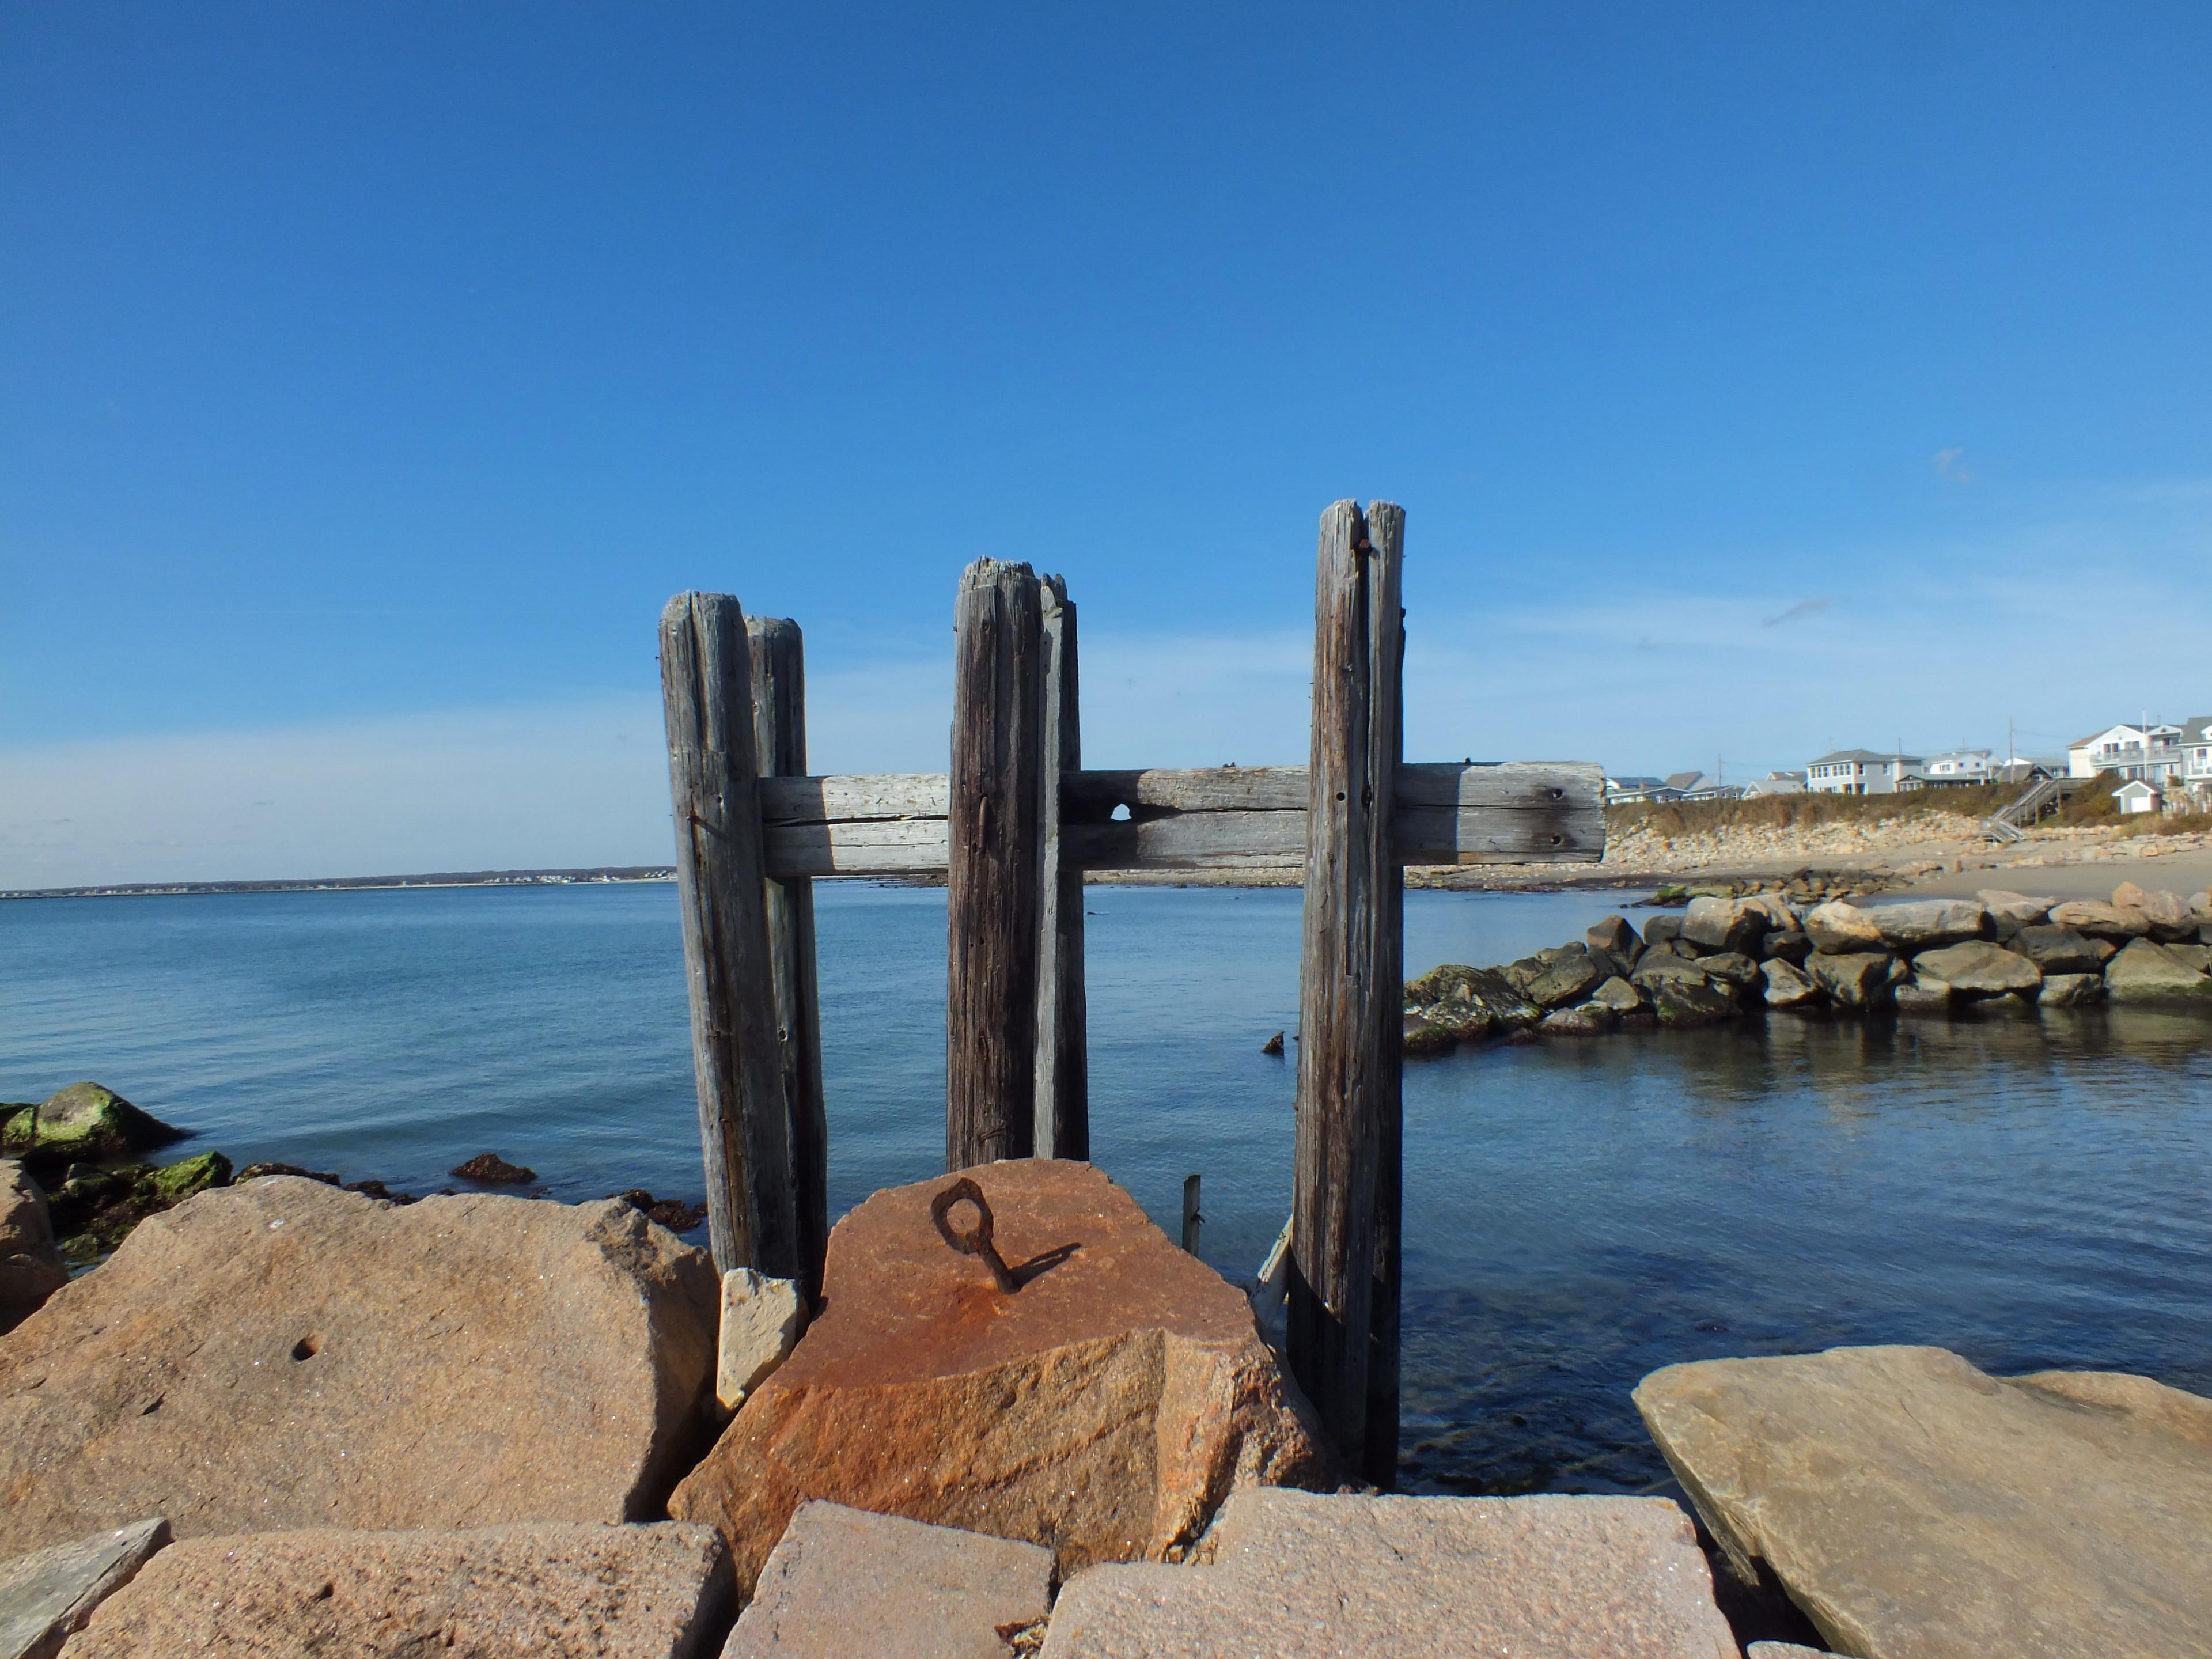 Point Judith, Rhode Island, United States of America